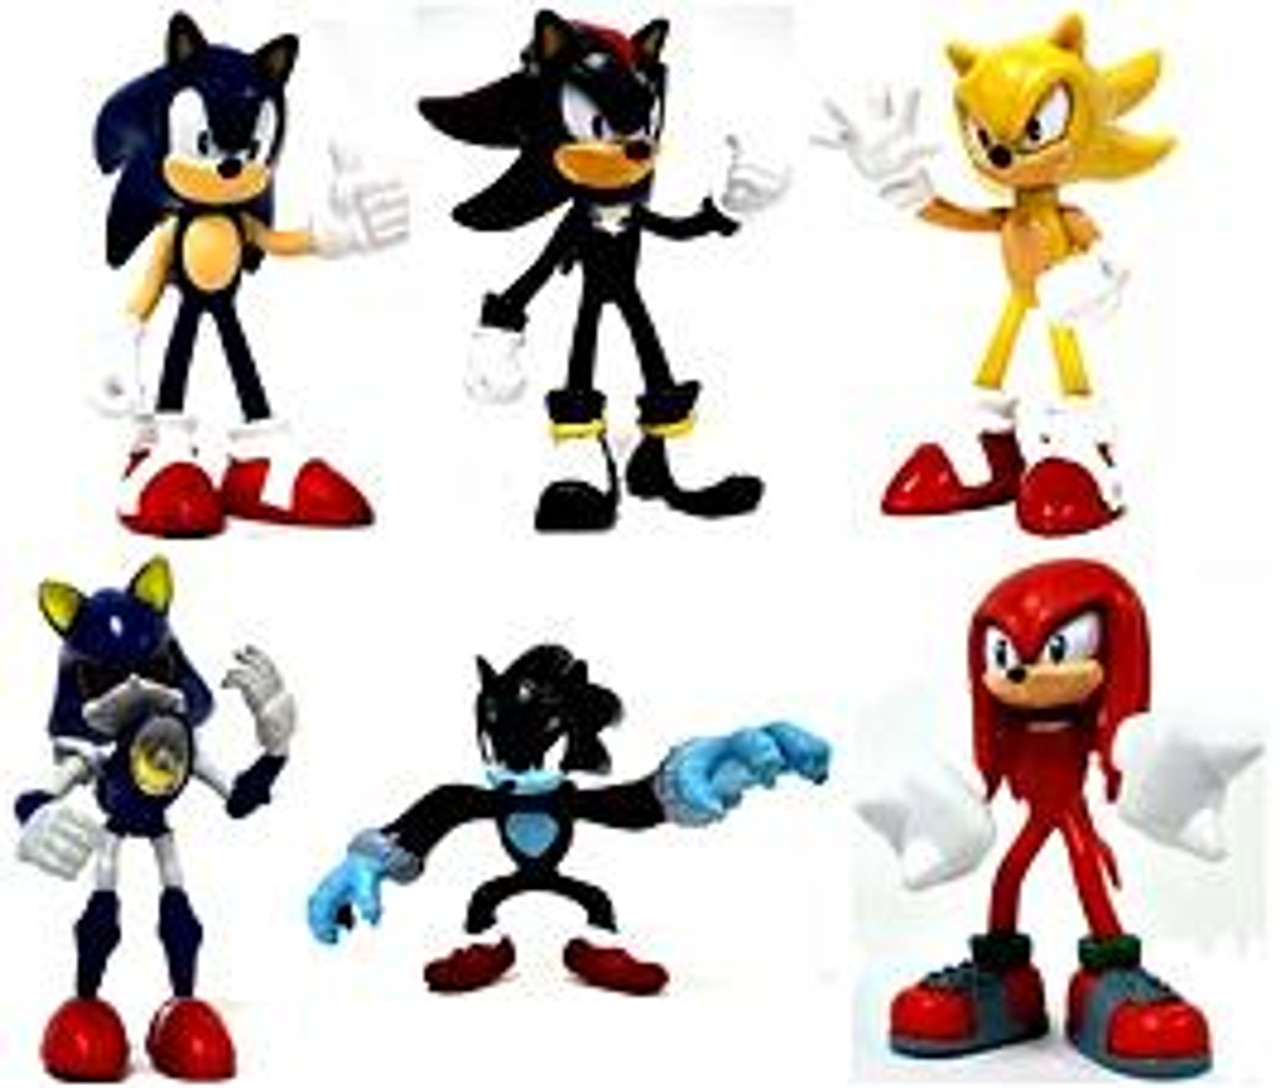 Gacha Sonic The Hedgehog Set of 6 2.5-Inch Mini Figures